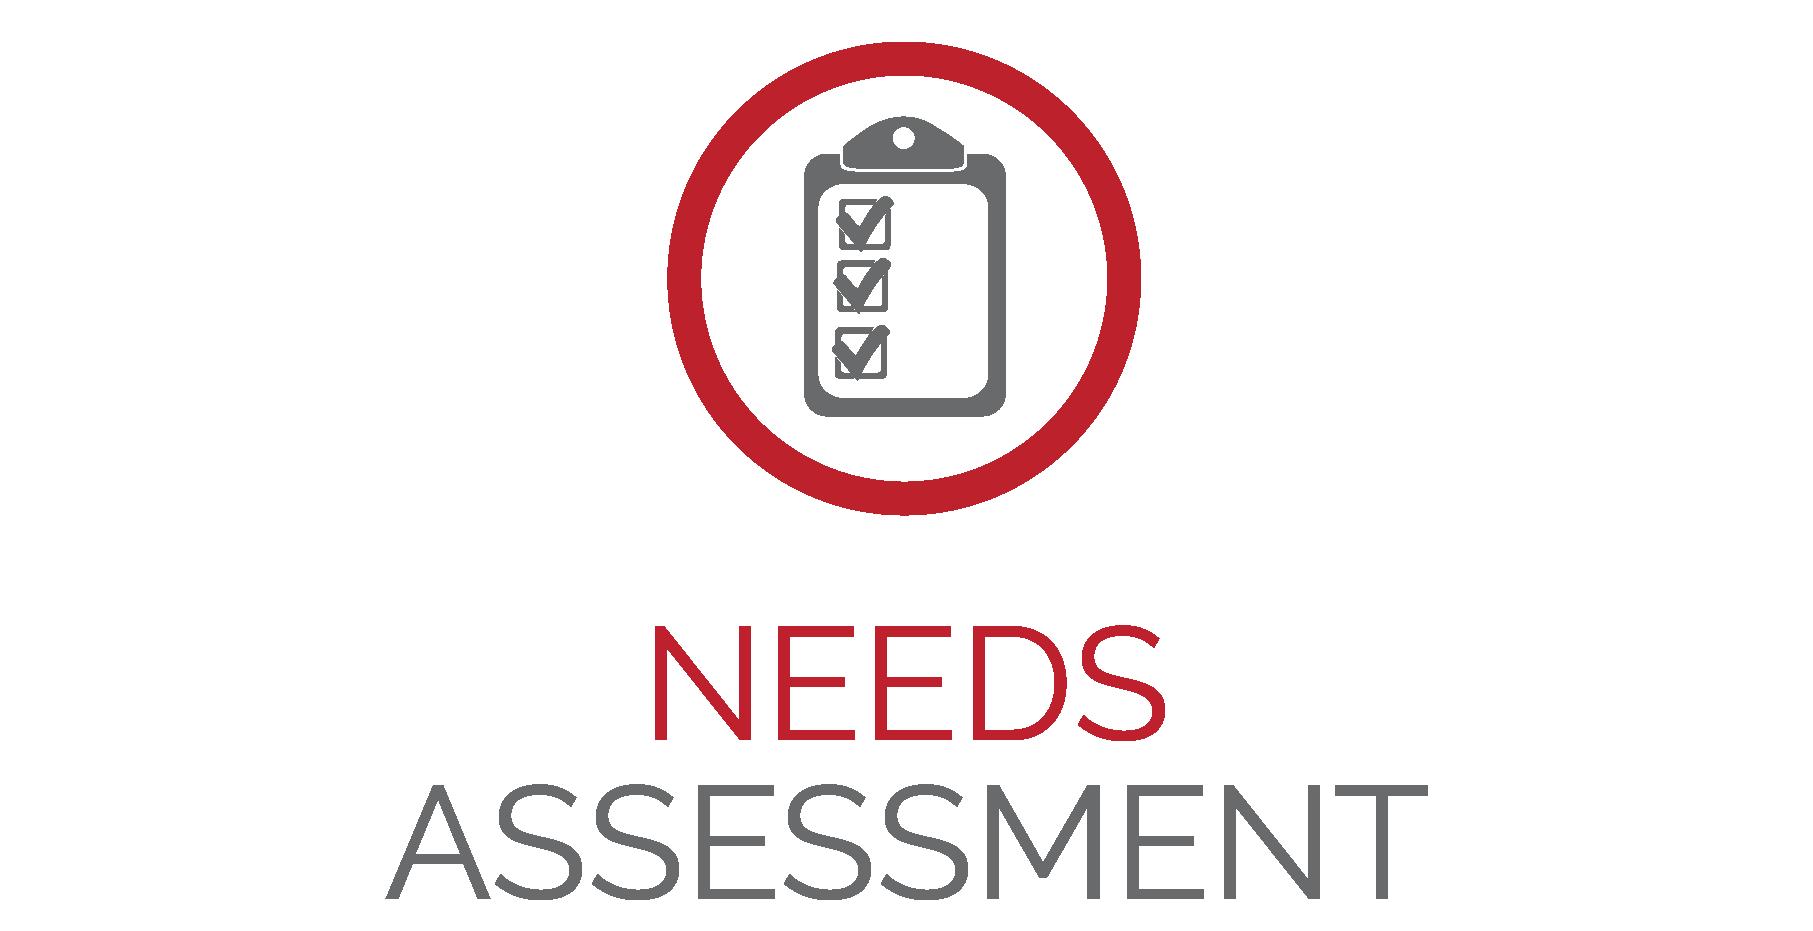 Design templates charming assess. Evaluation clipart needs assessment